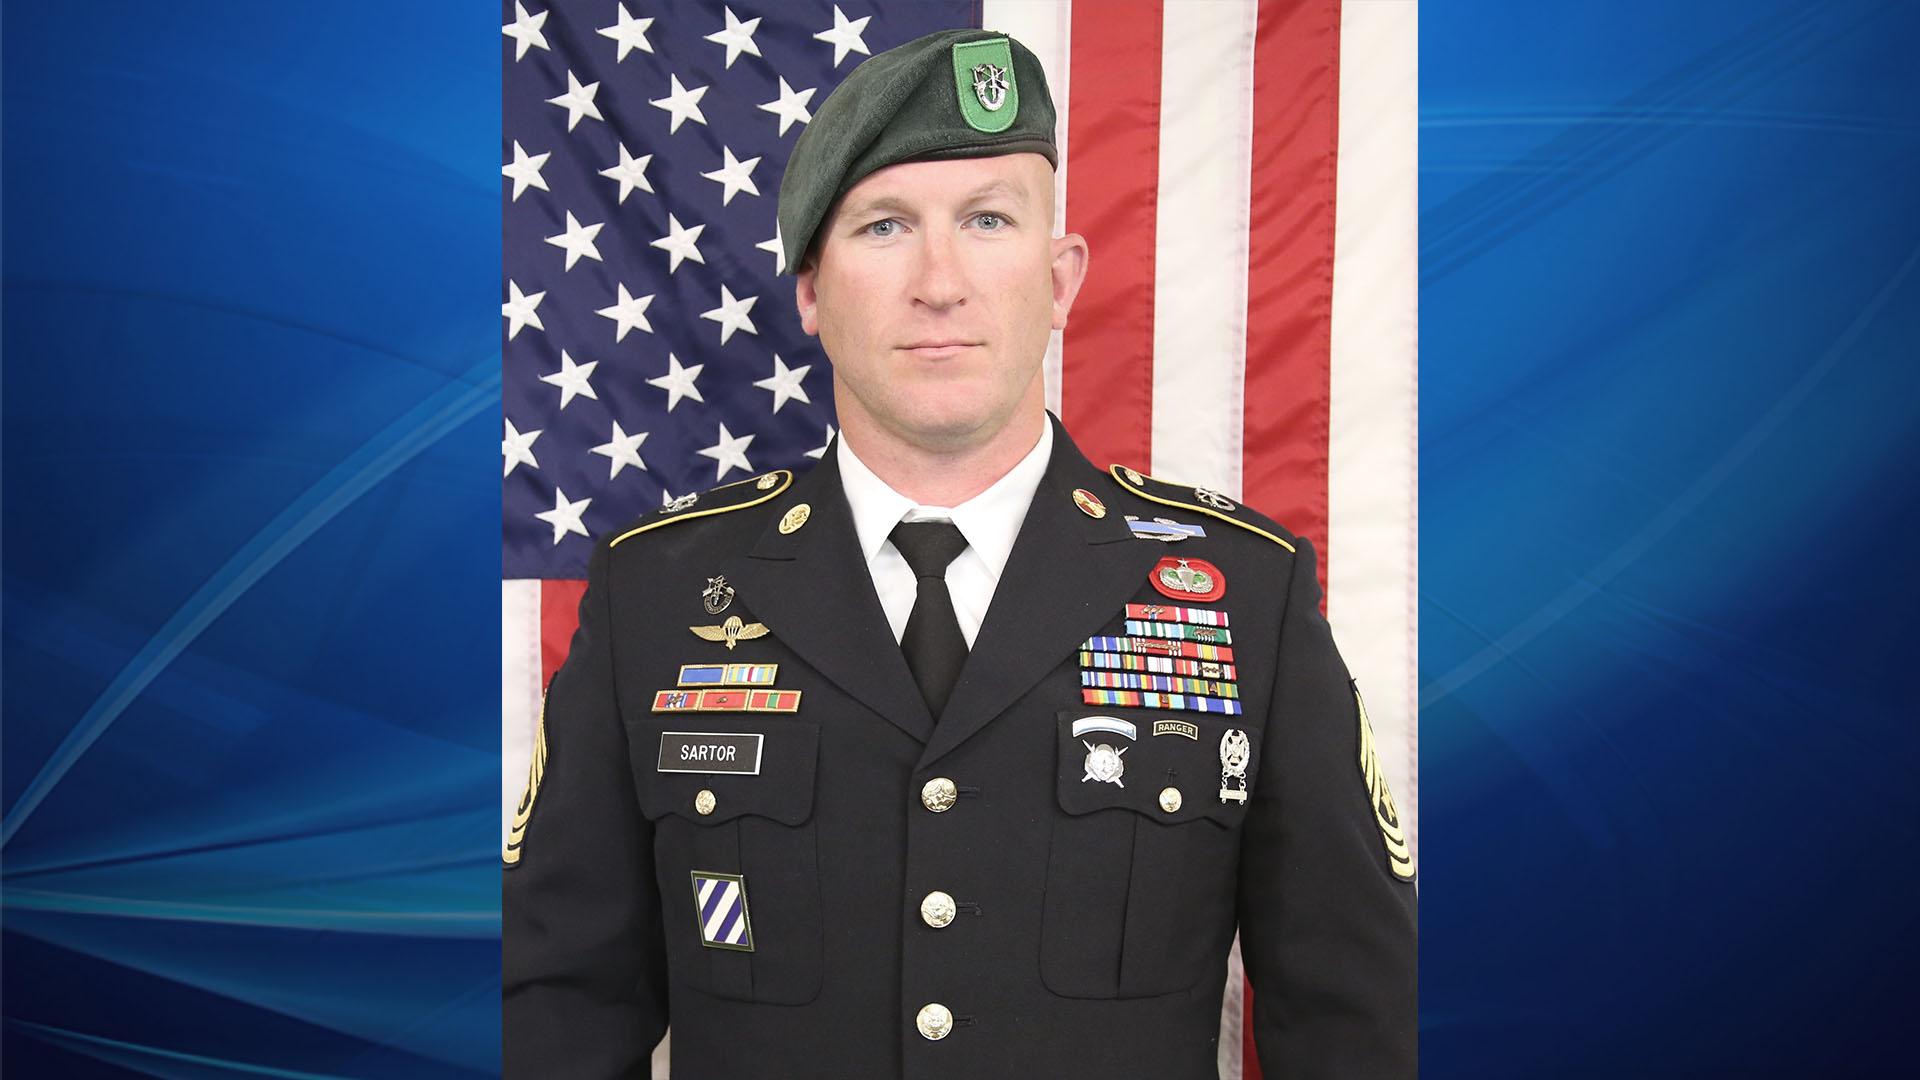 U S  service member killed in Afghanistan identified | WFLA